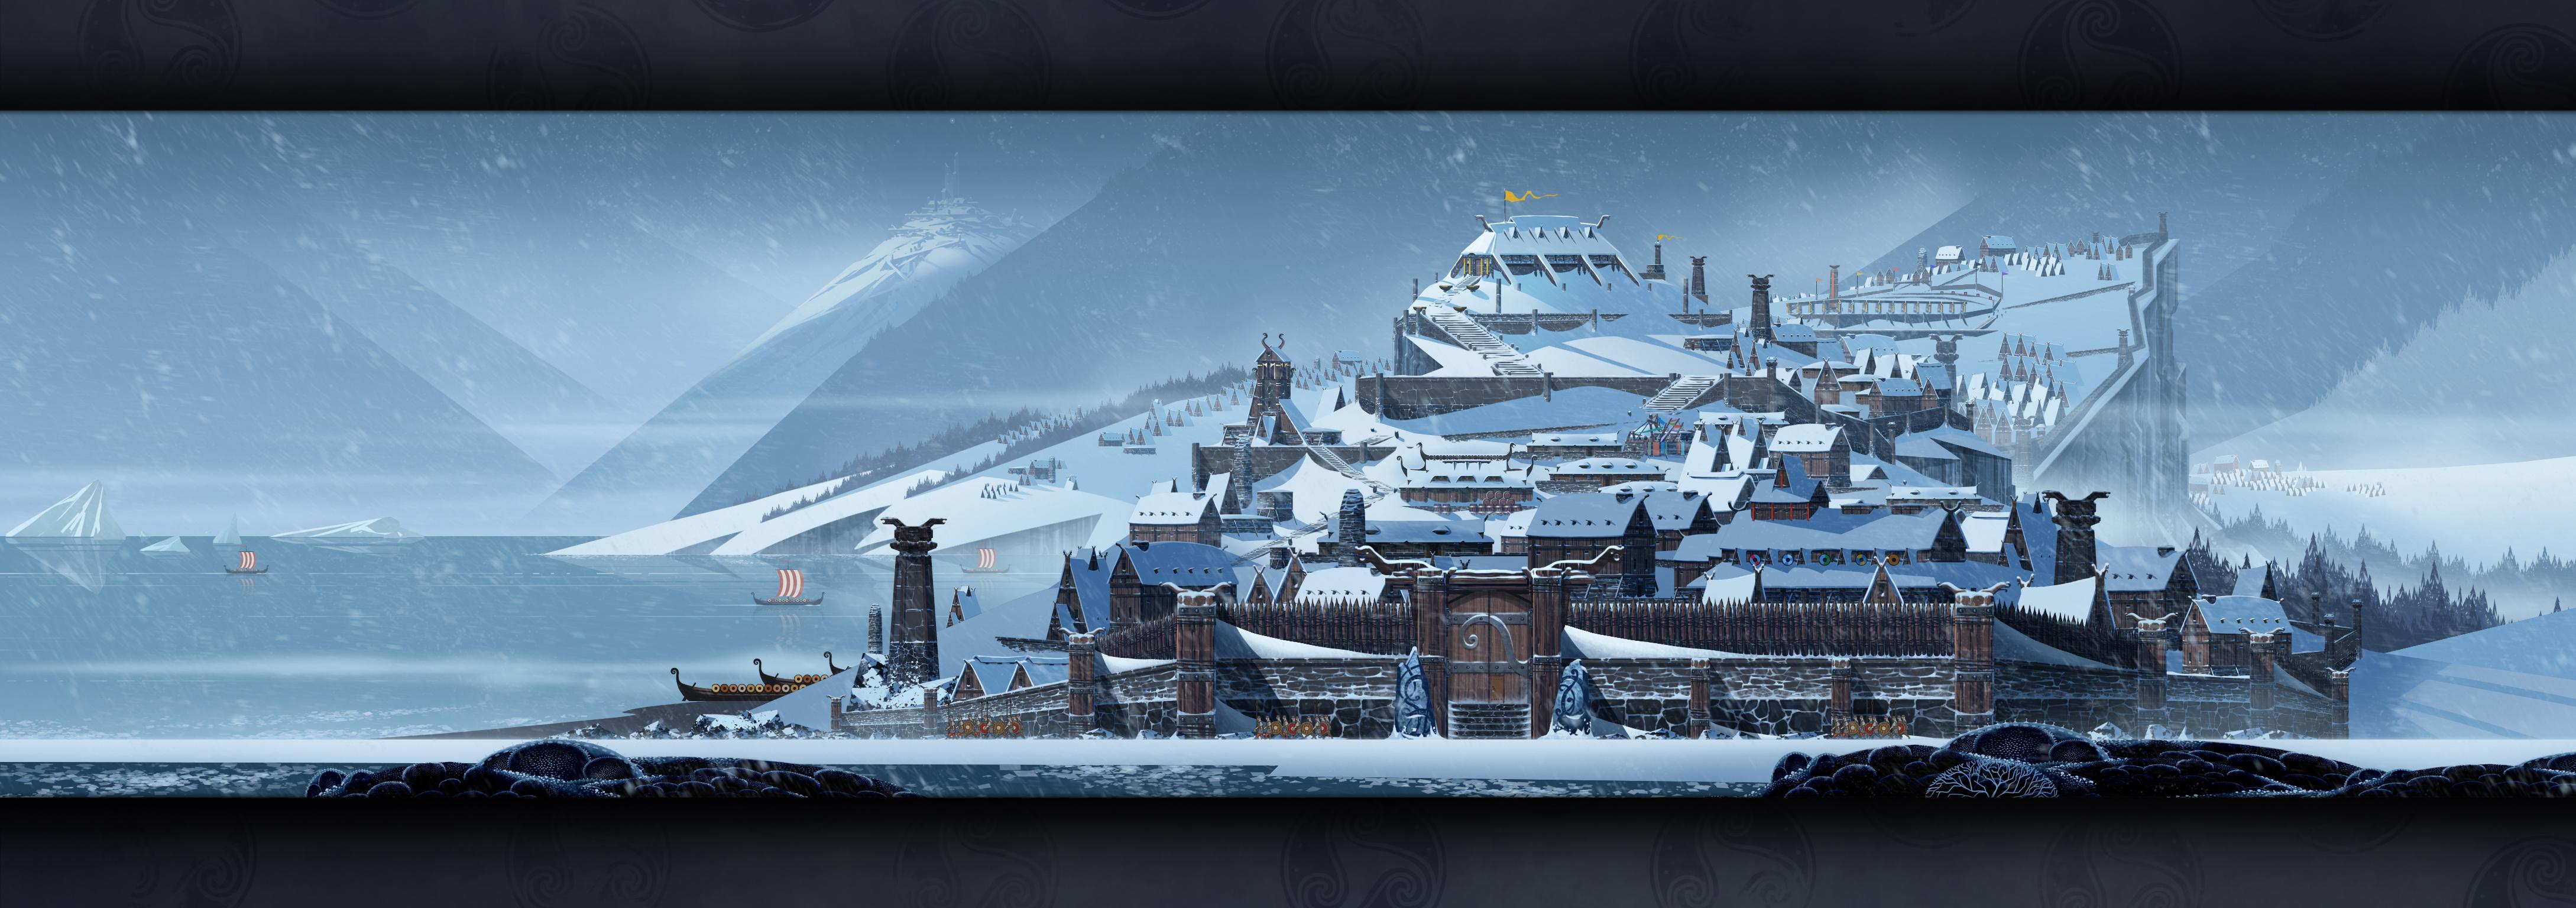 The Banner Saga New Wallpaper City of Strand 4357x1536